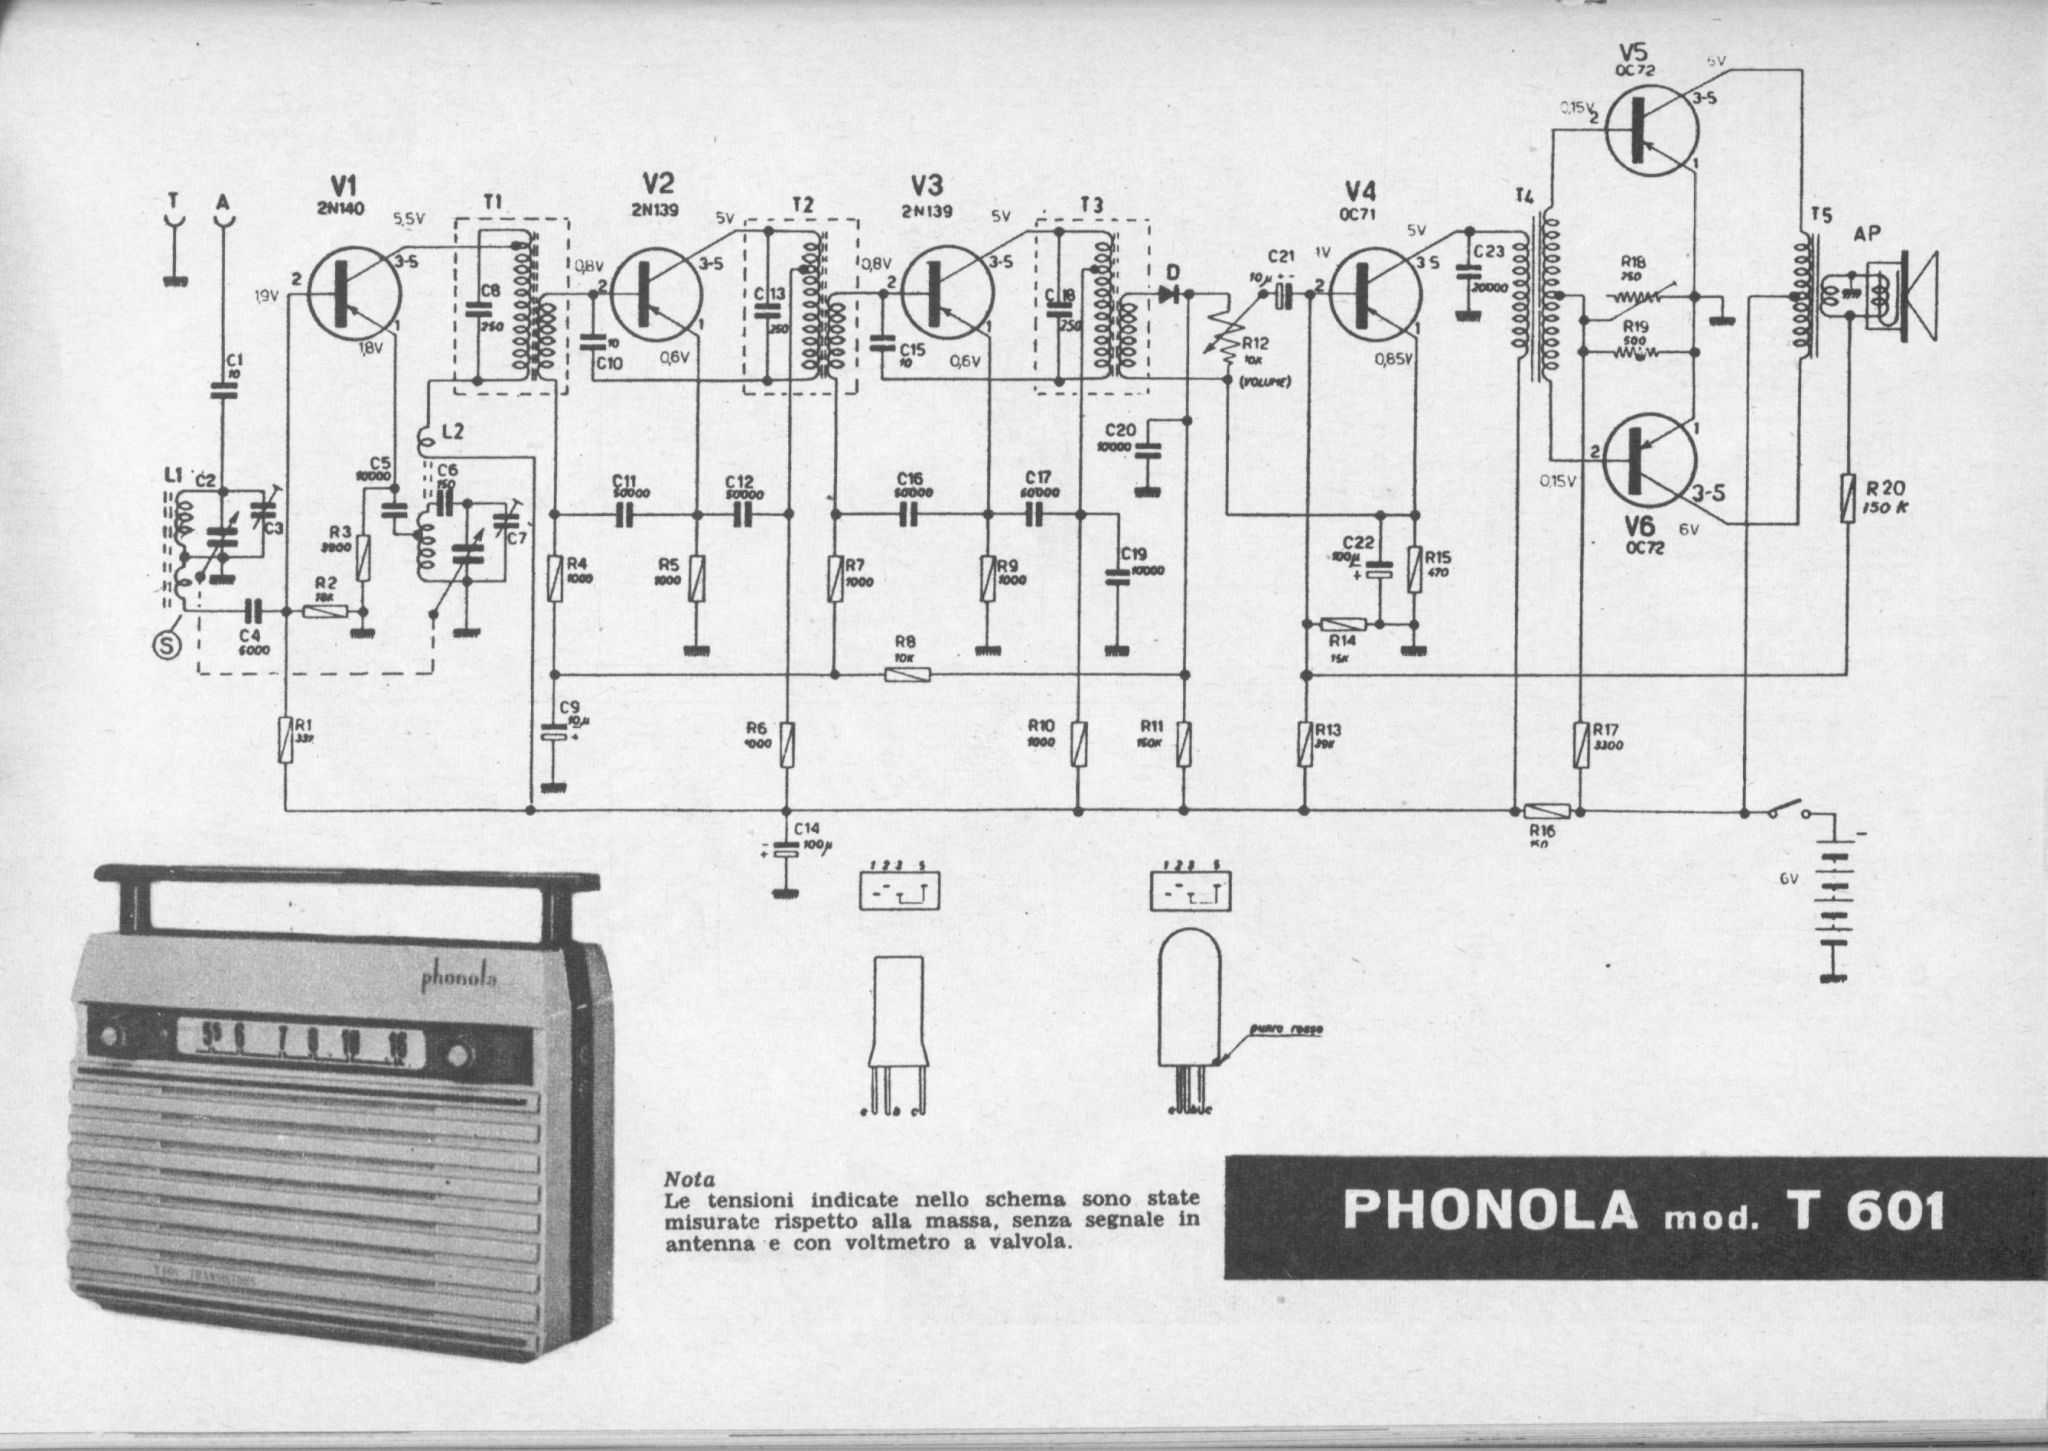 Transistor Diagrams Radio Receiver Circuit Diagram On Ham Am Transmitter Schematics Phonola Mod T 601